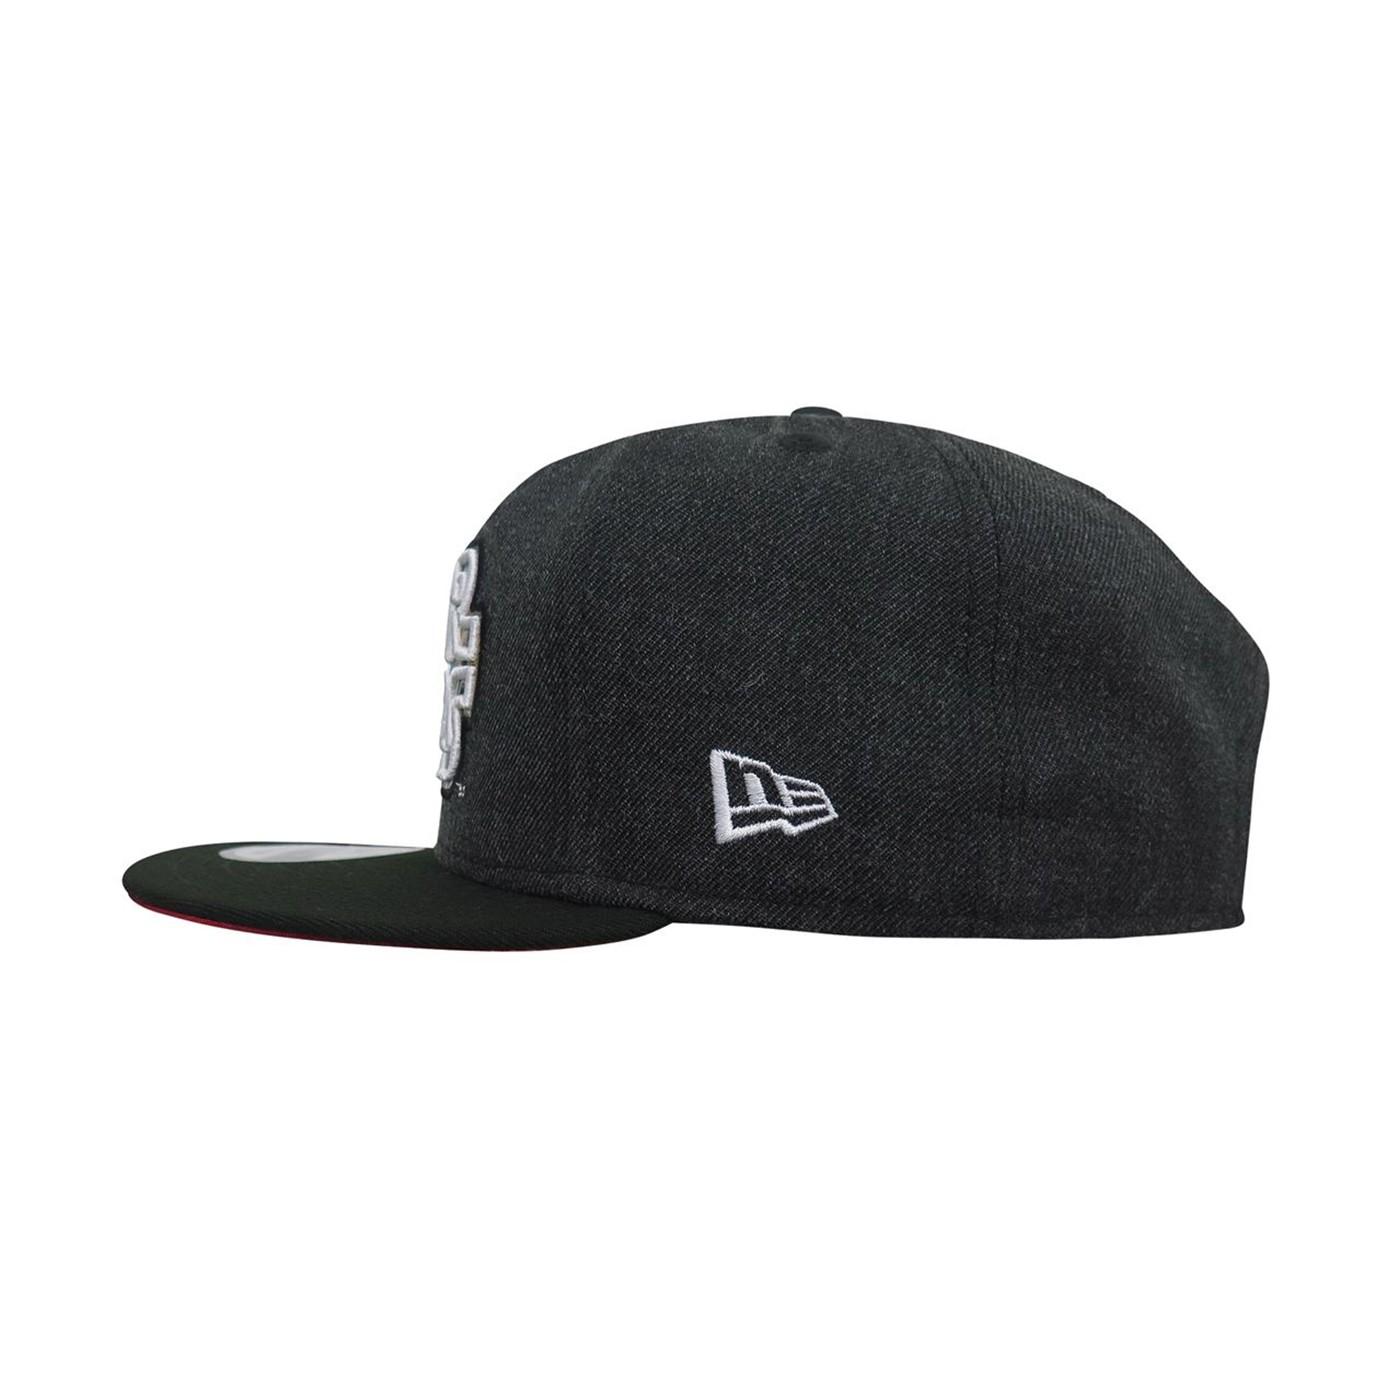 Star Wars Last Jedi Vs Logo 9Fifty Adjustable Hat